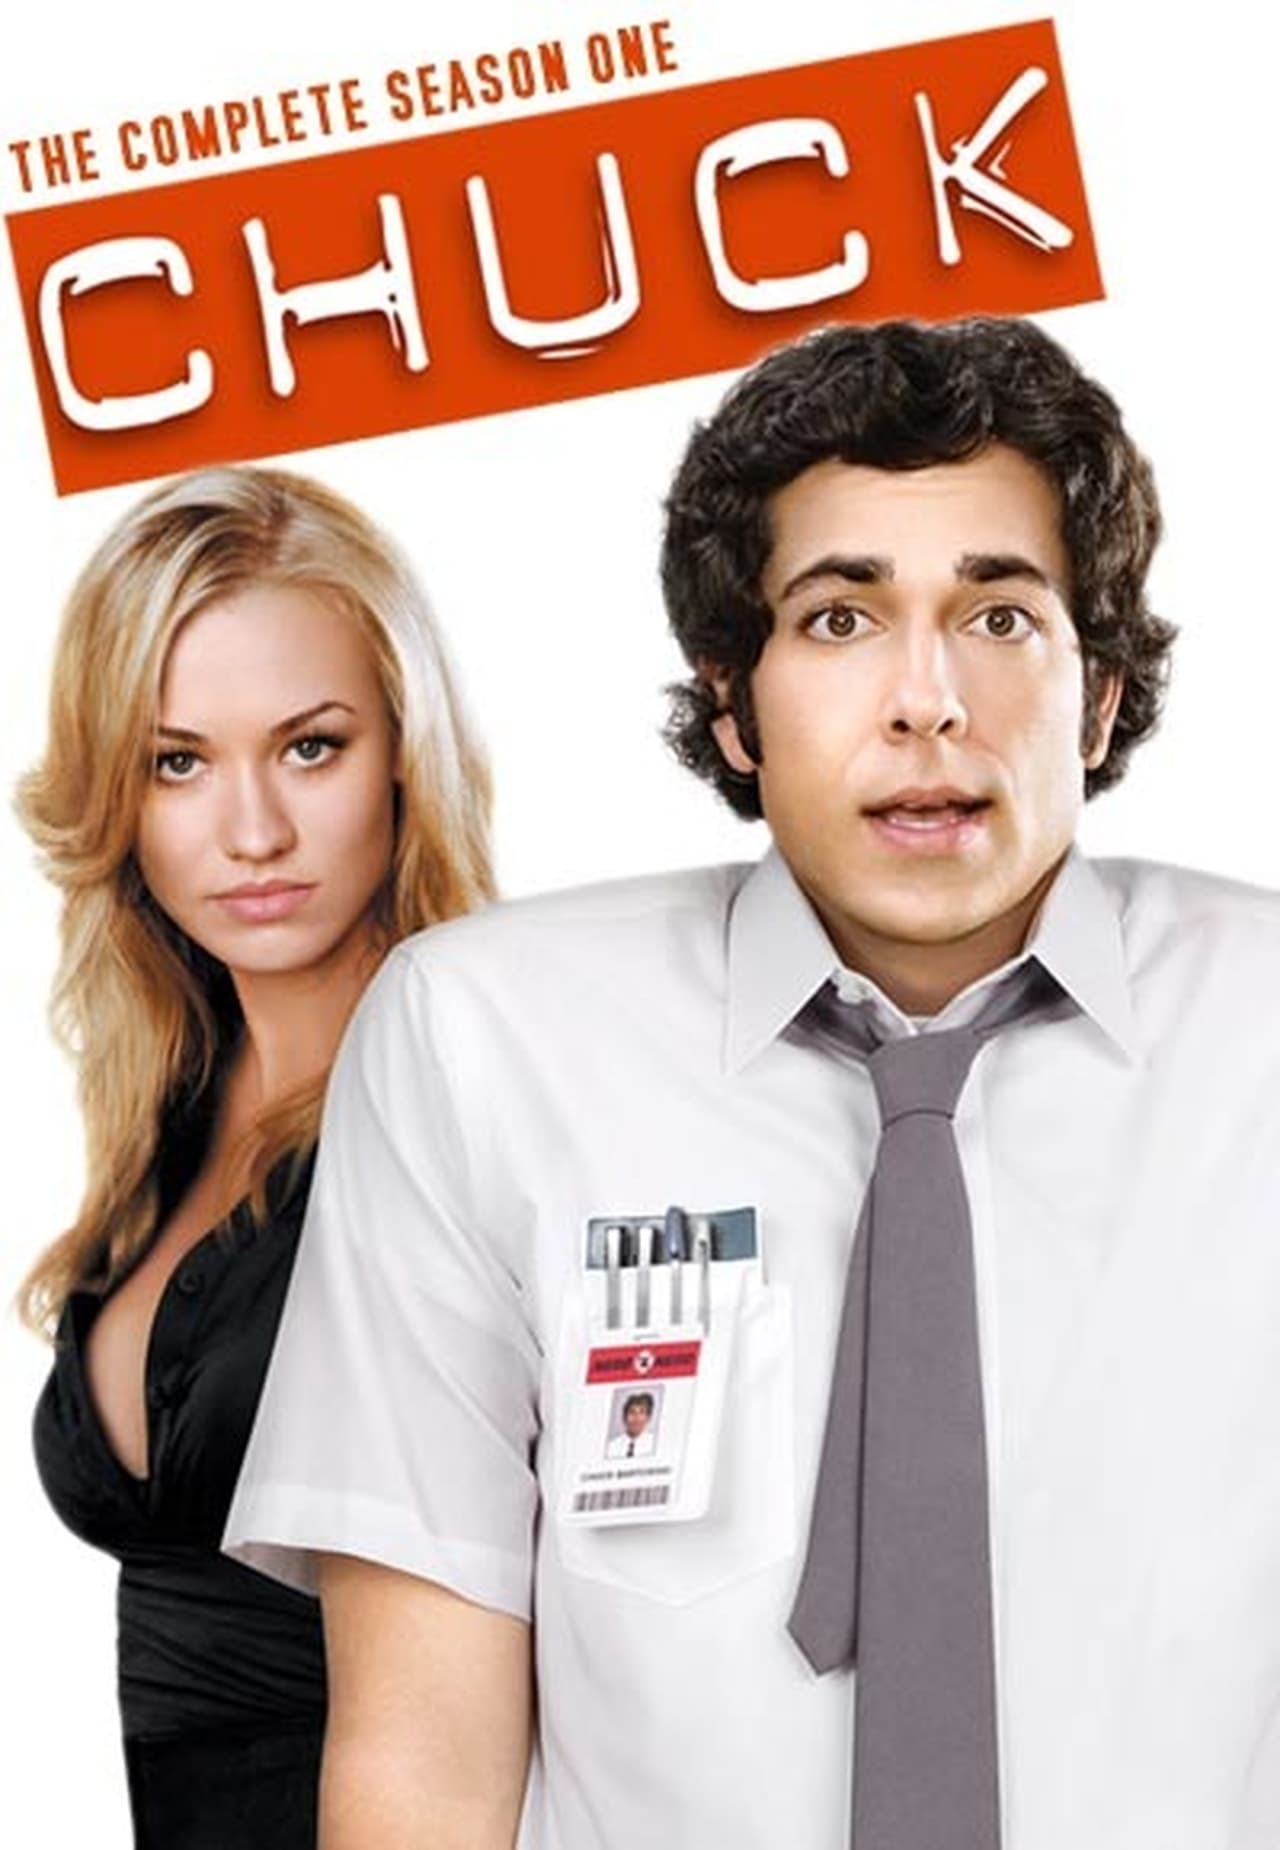 Chuck season 4 subtitles download - Malayalam movie charlie video